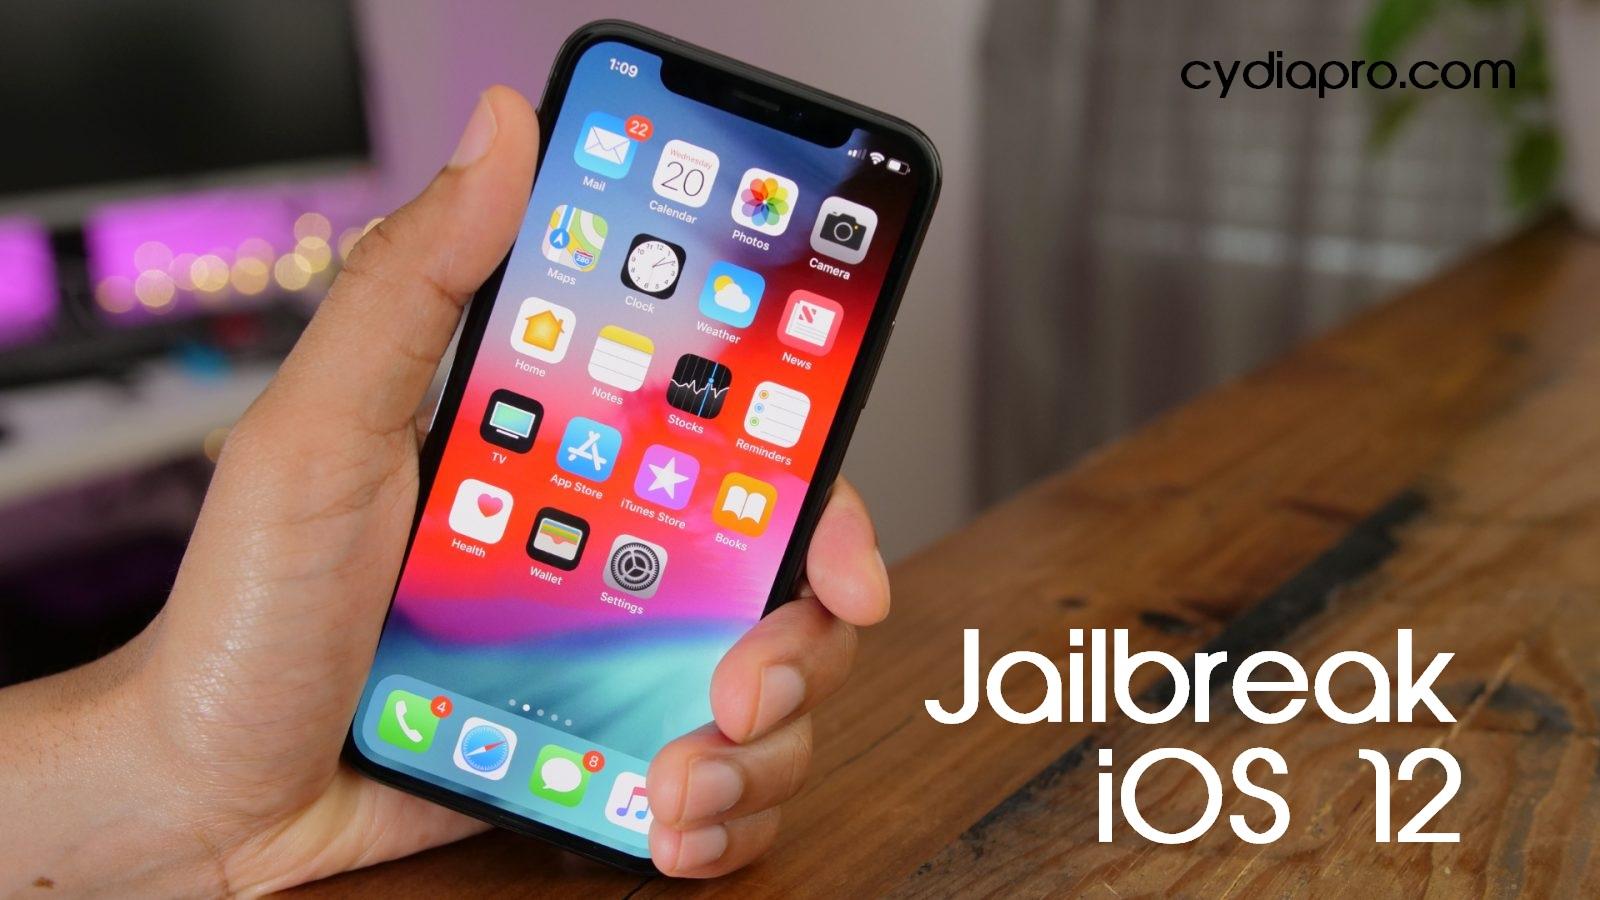 Jailbreak iOS 12, 11 4 1 and Below versions to Install Cydia